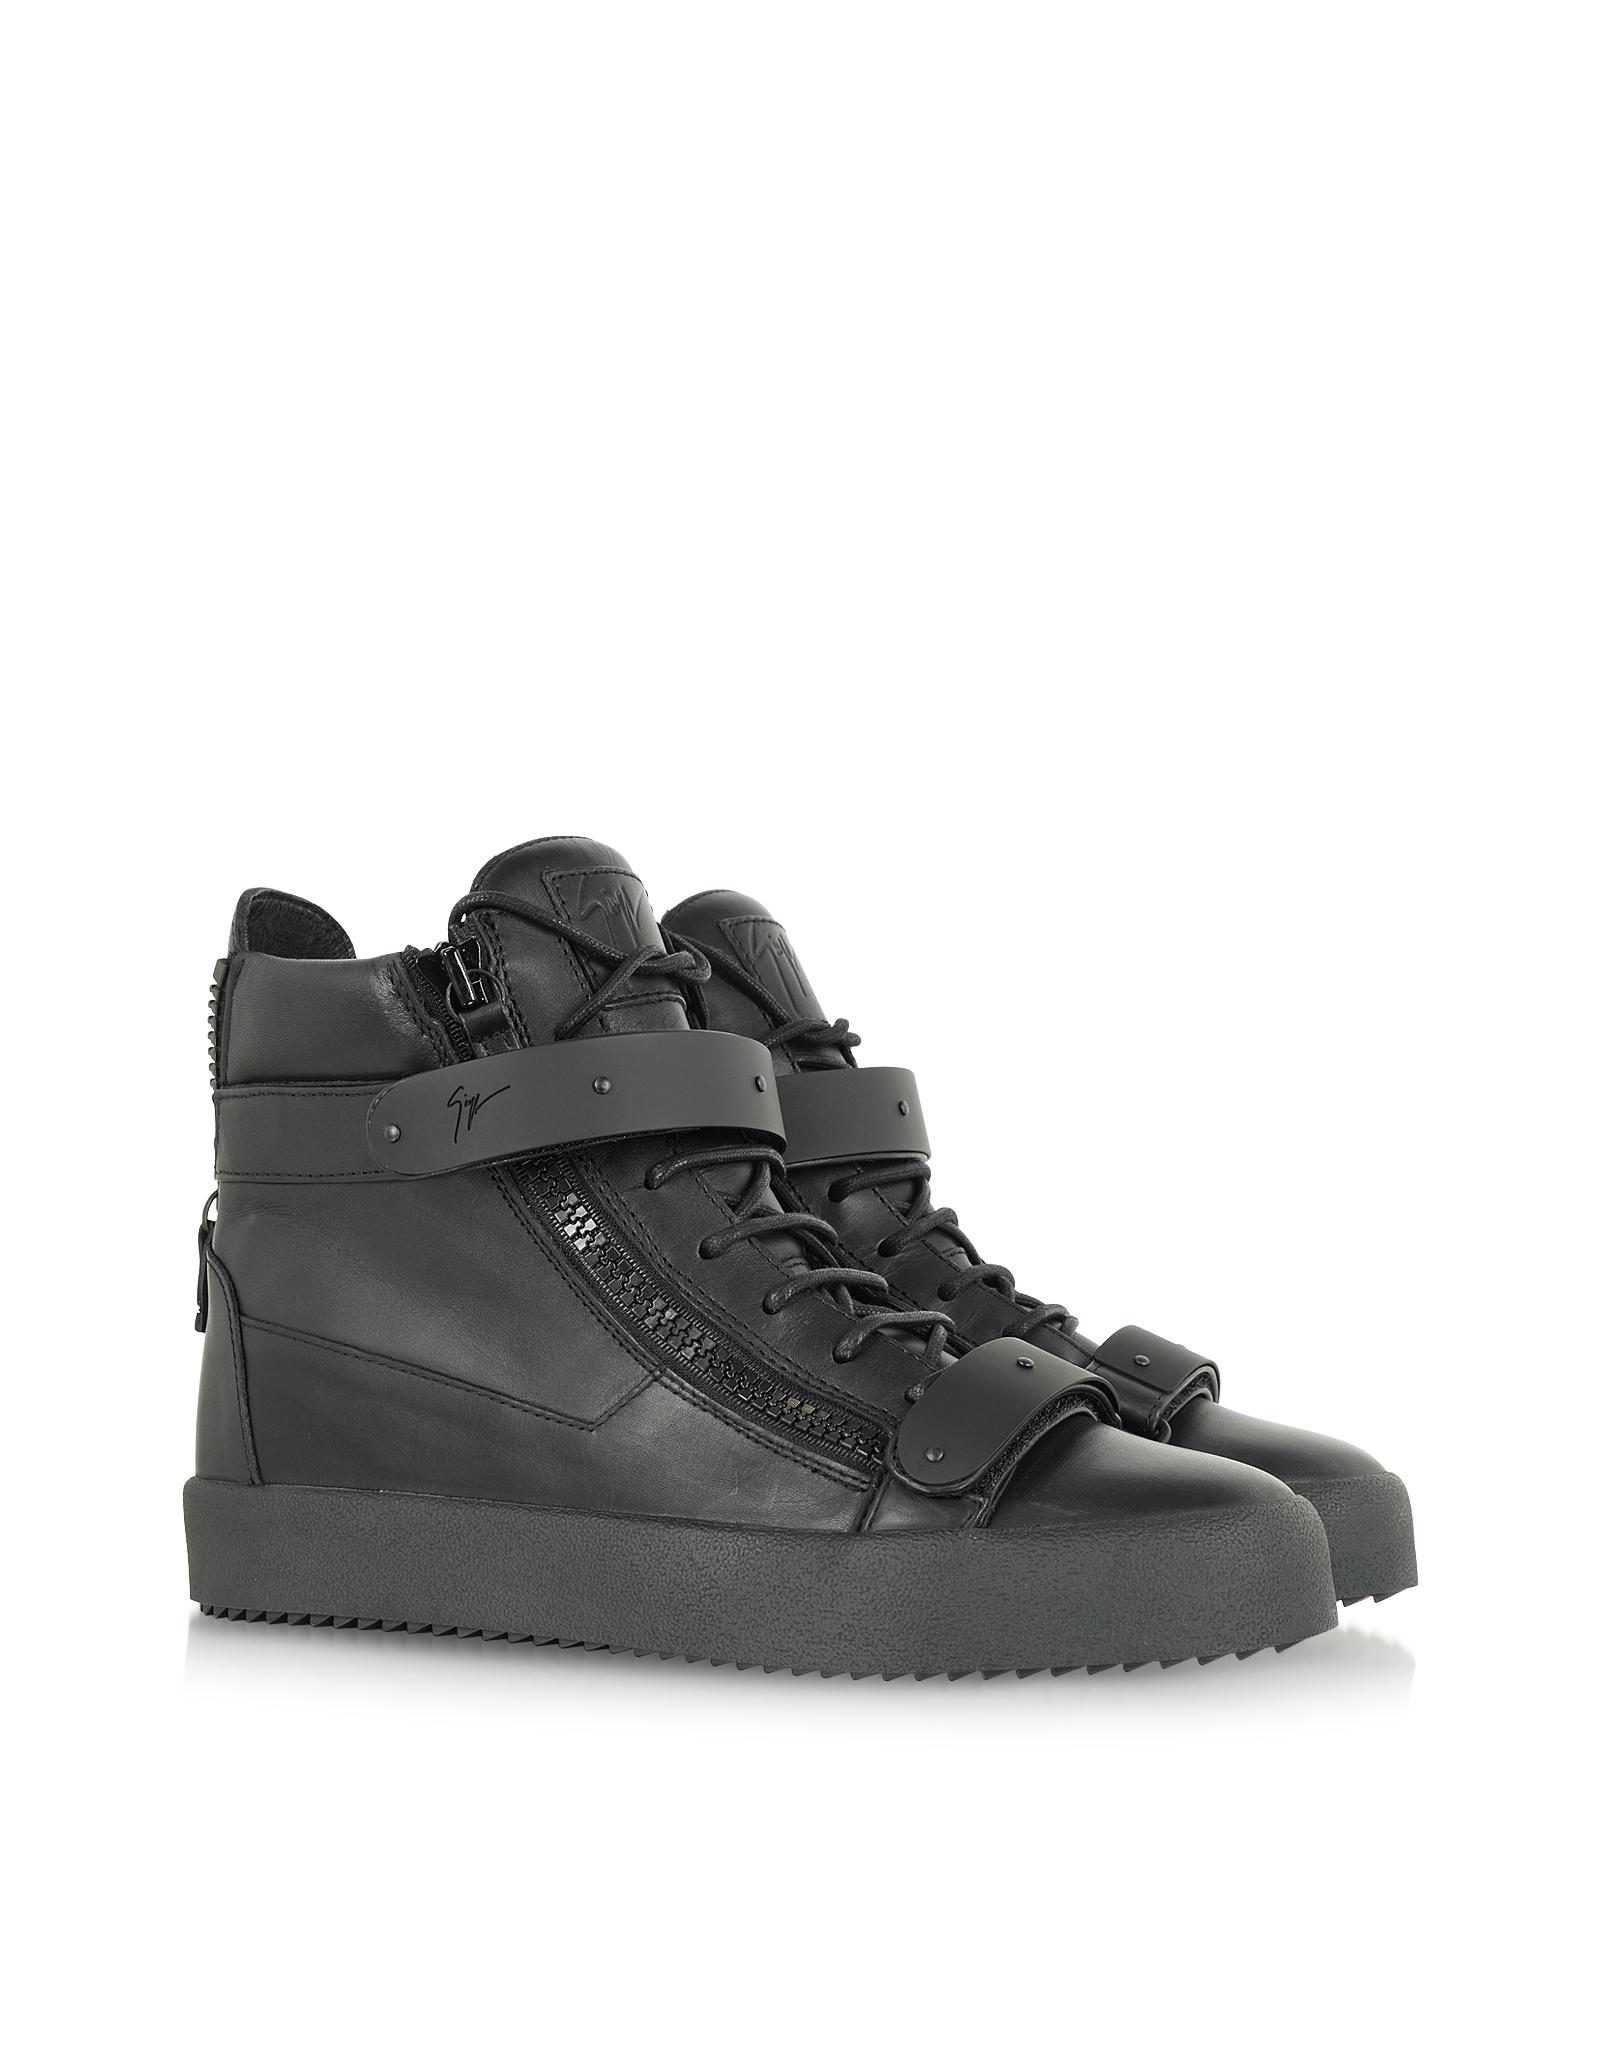 River Island Old School Shoes Men